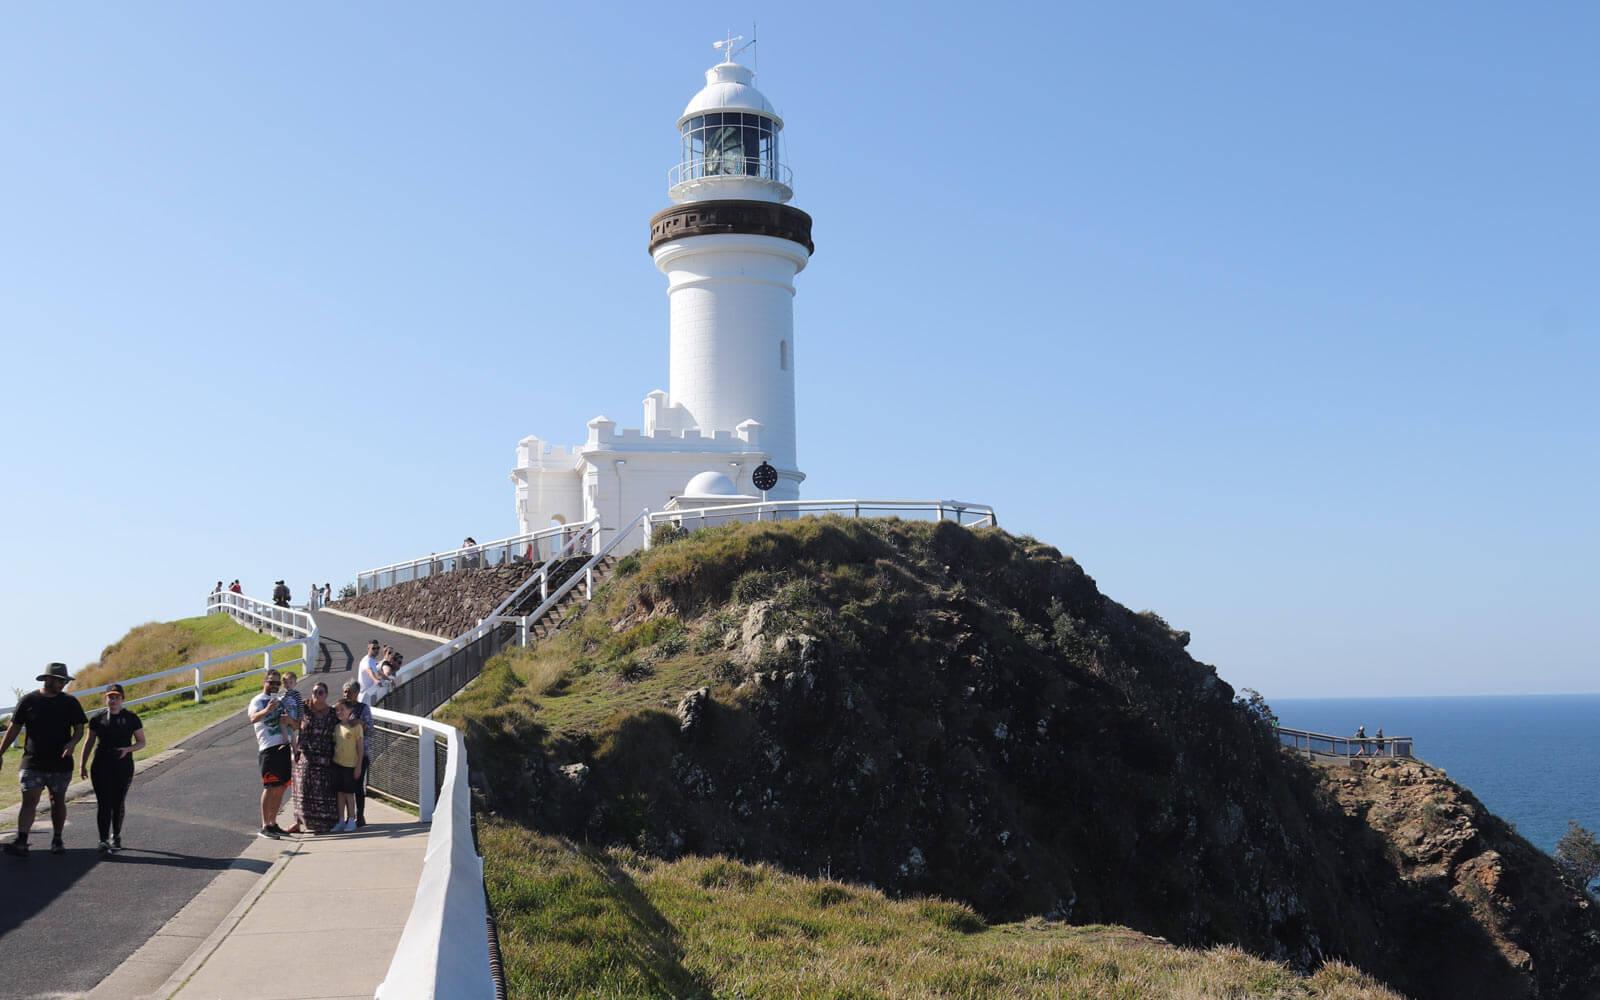 Schüleraustausch Australien: Blick auf den Leuchtturm in Byron Bay